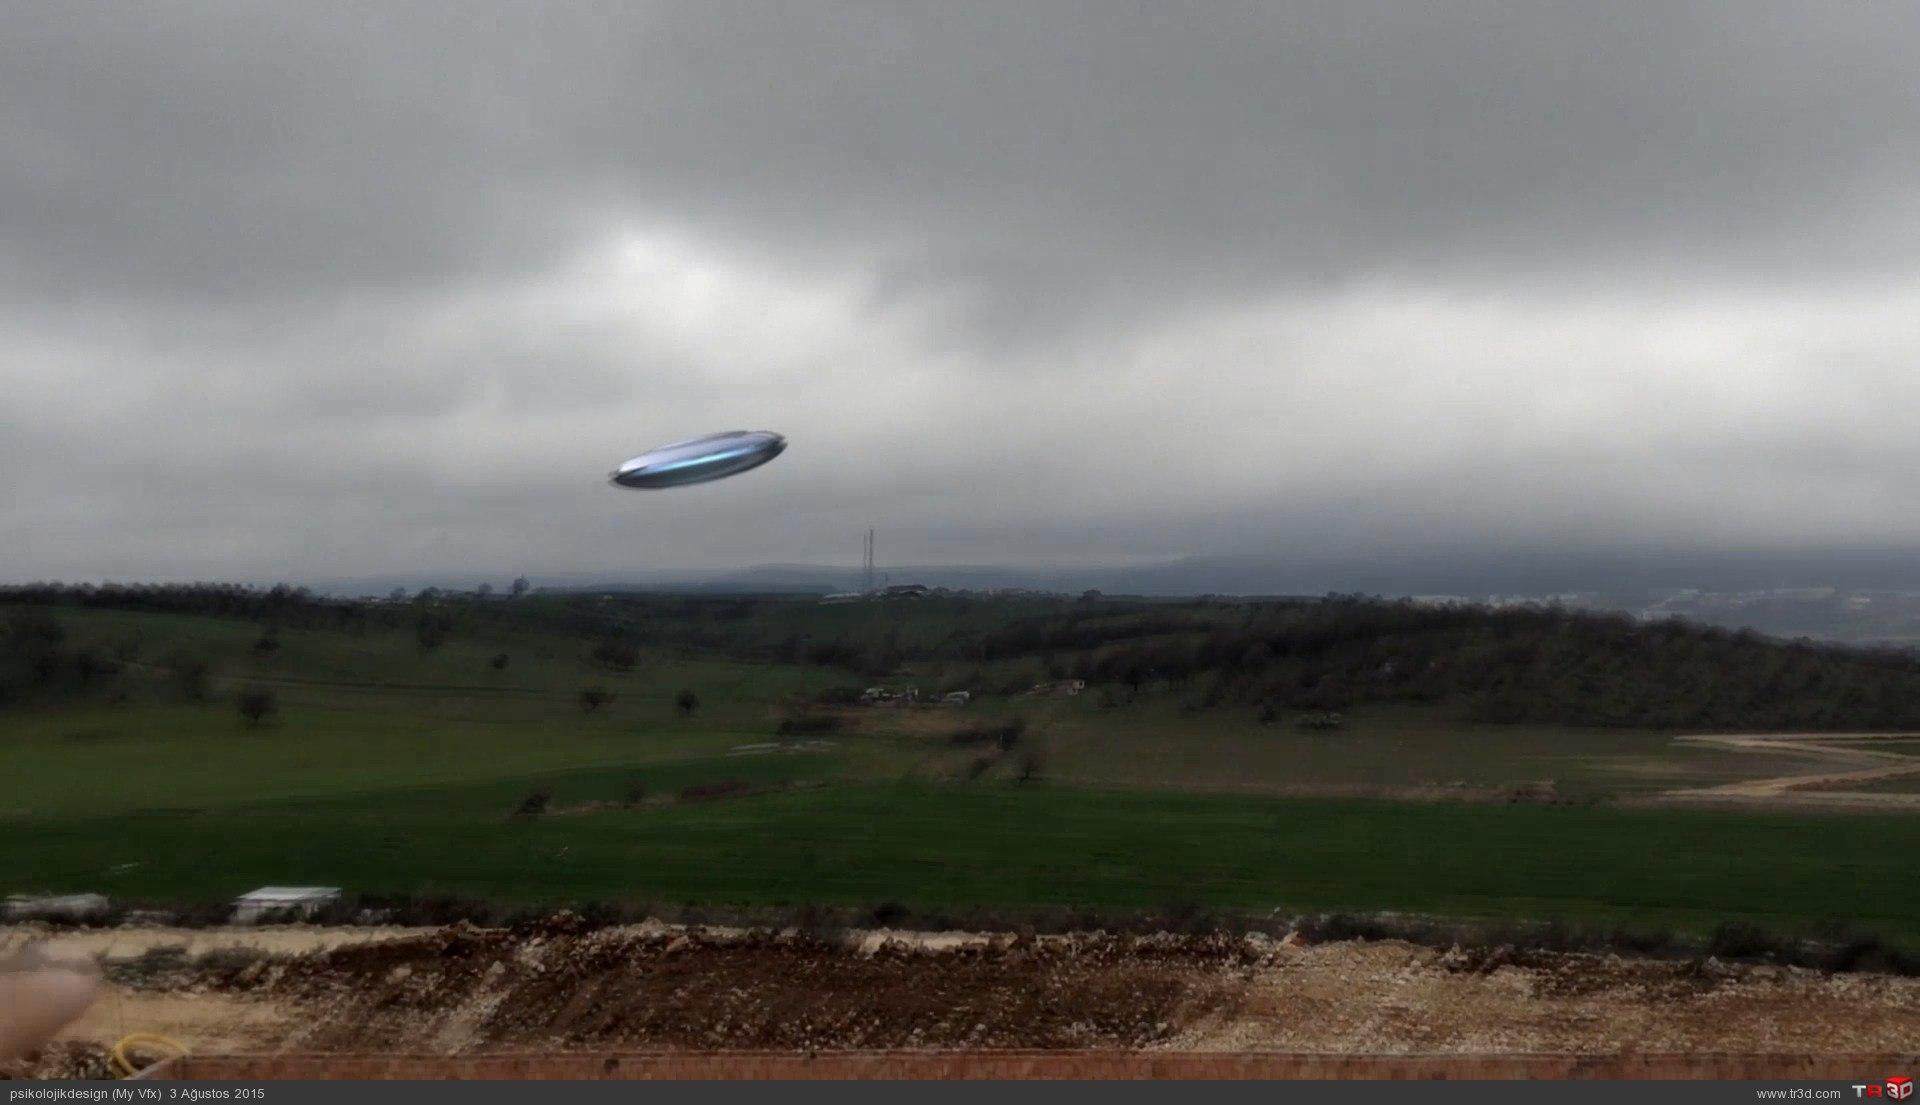 Ufo Rising